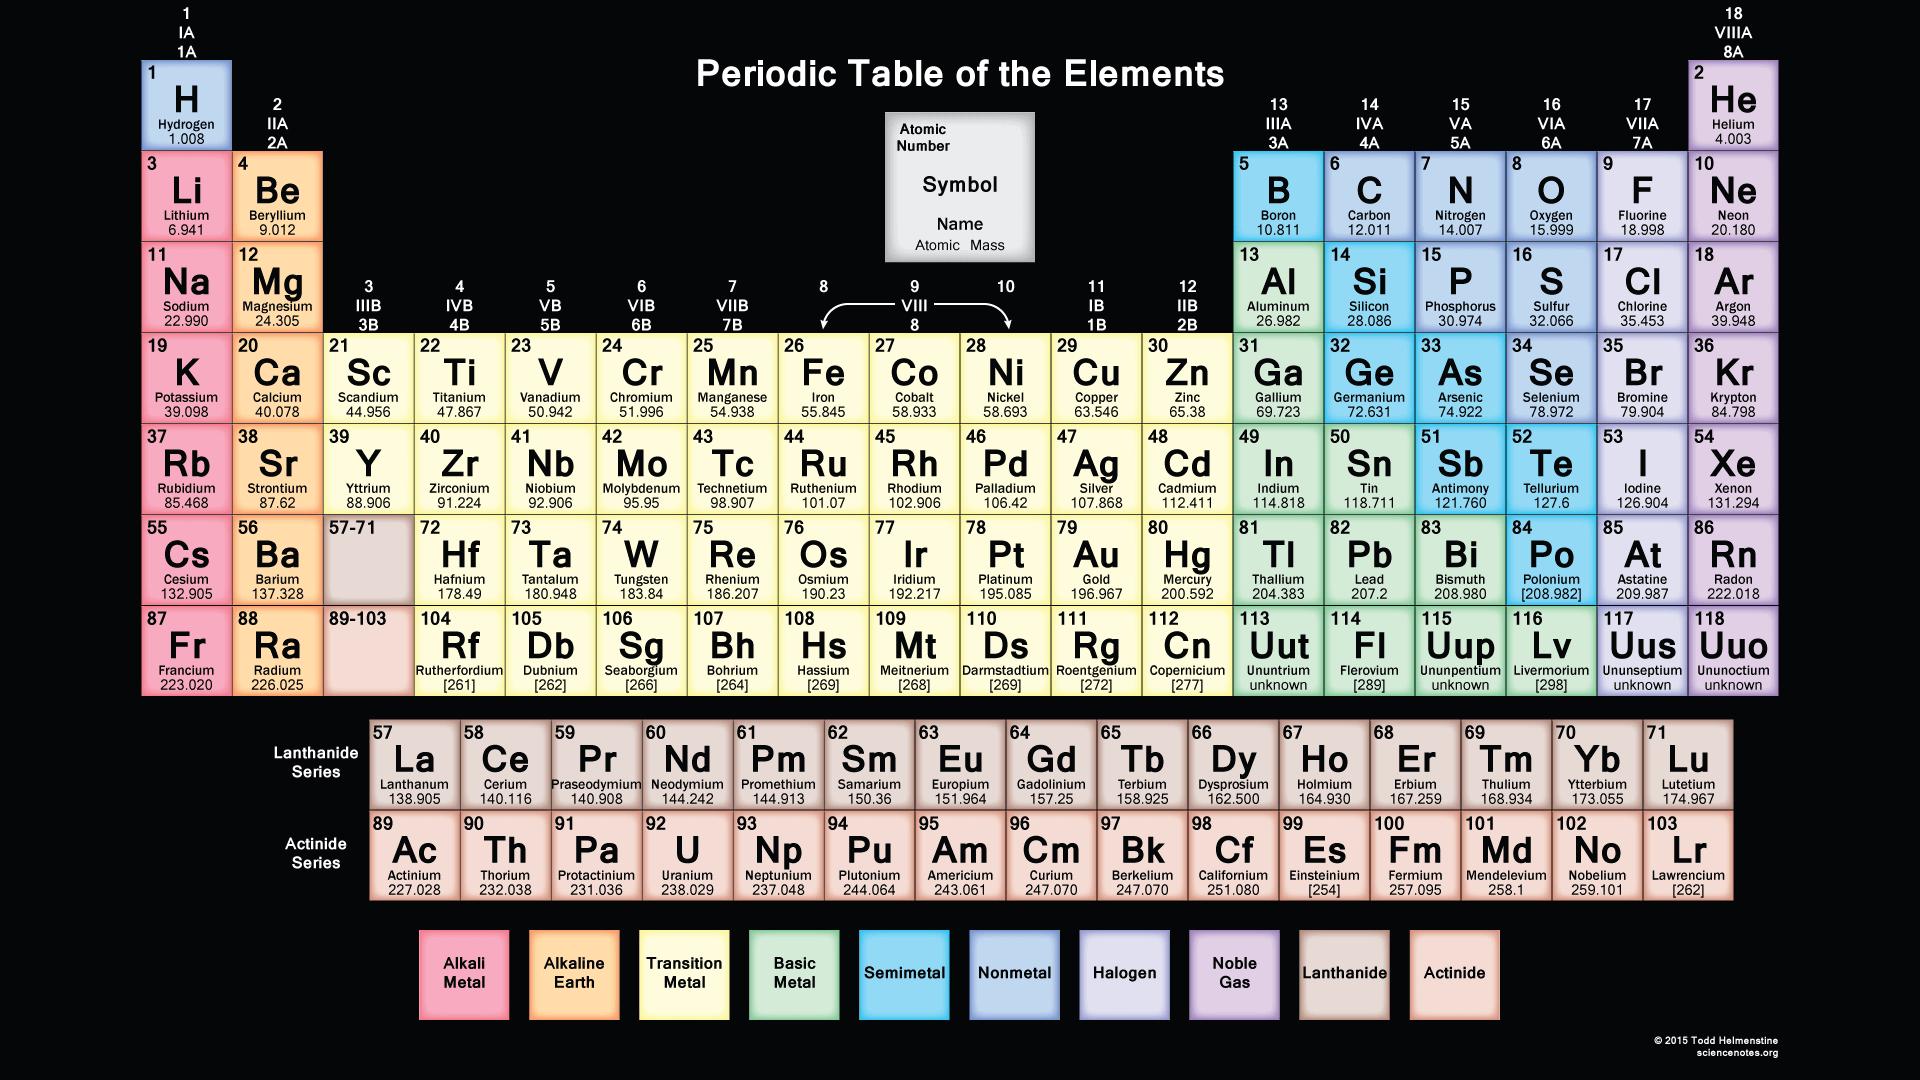 Tabel periodik unsur kimia hd lengkap dan keterangan mastah tabel periodik unsur kimia hd lengkap dan keterangan ccuart Images